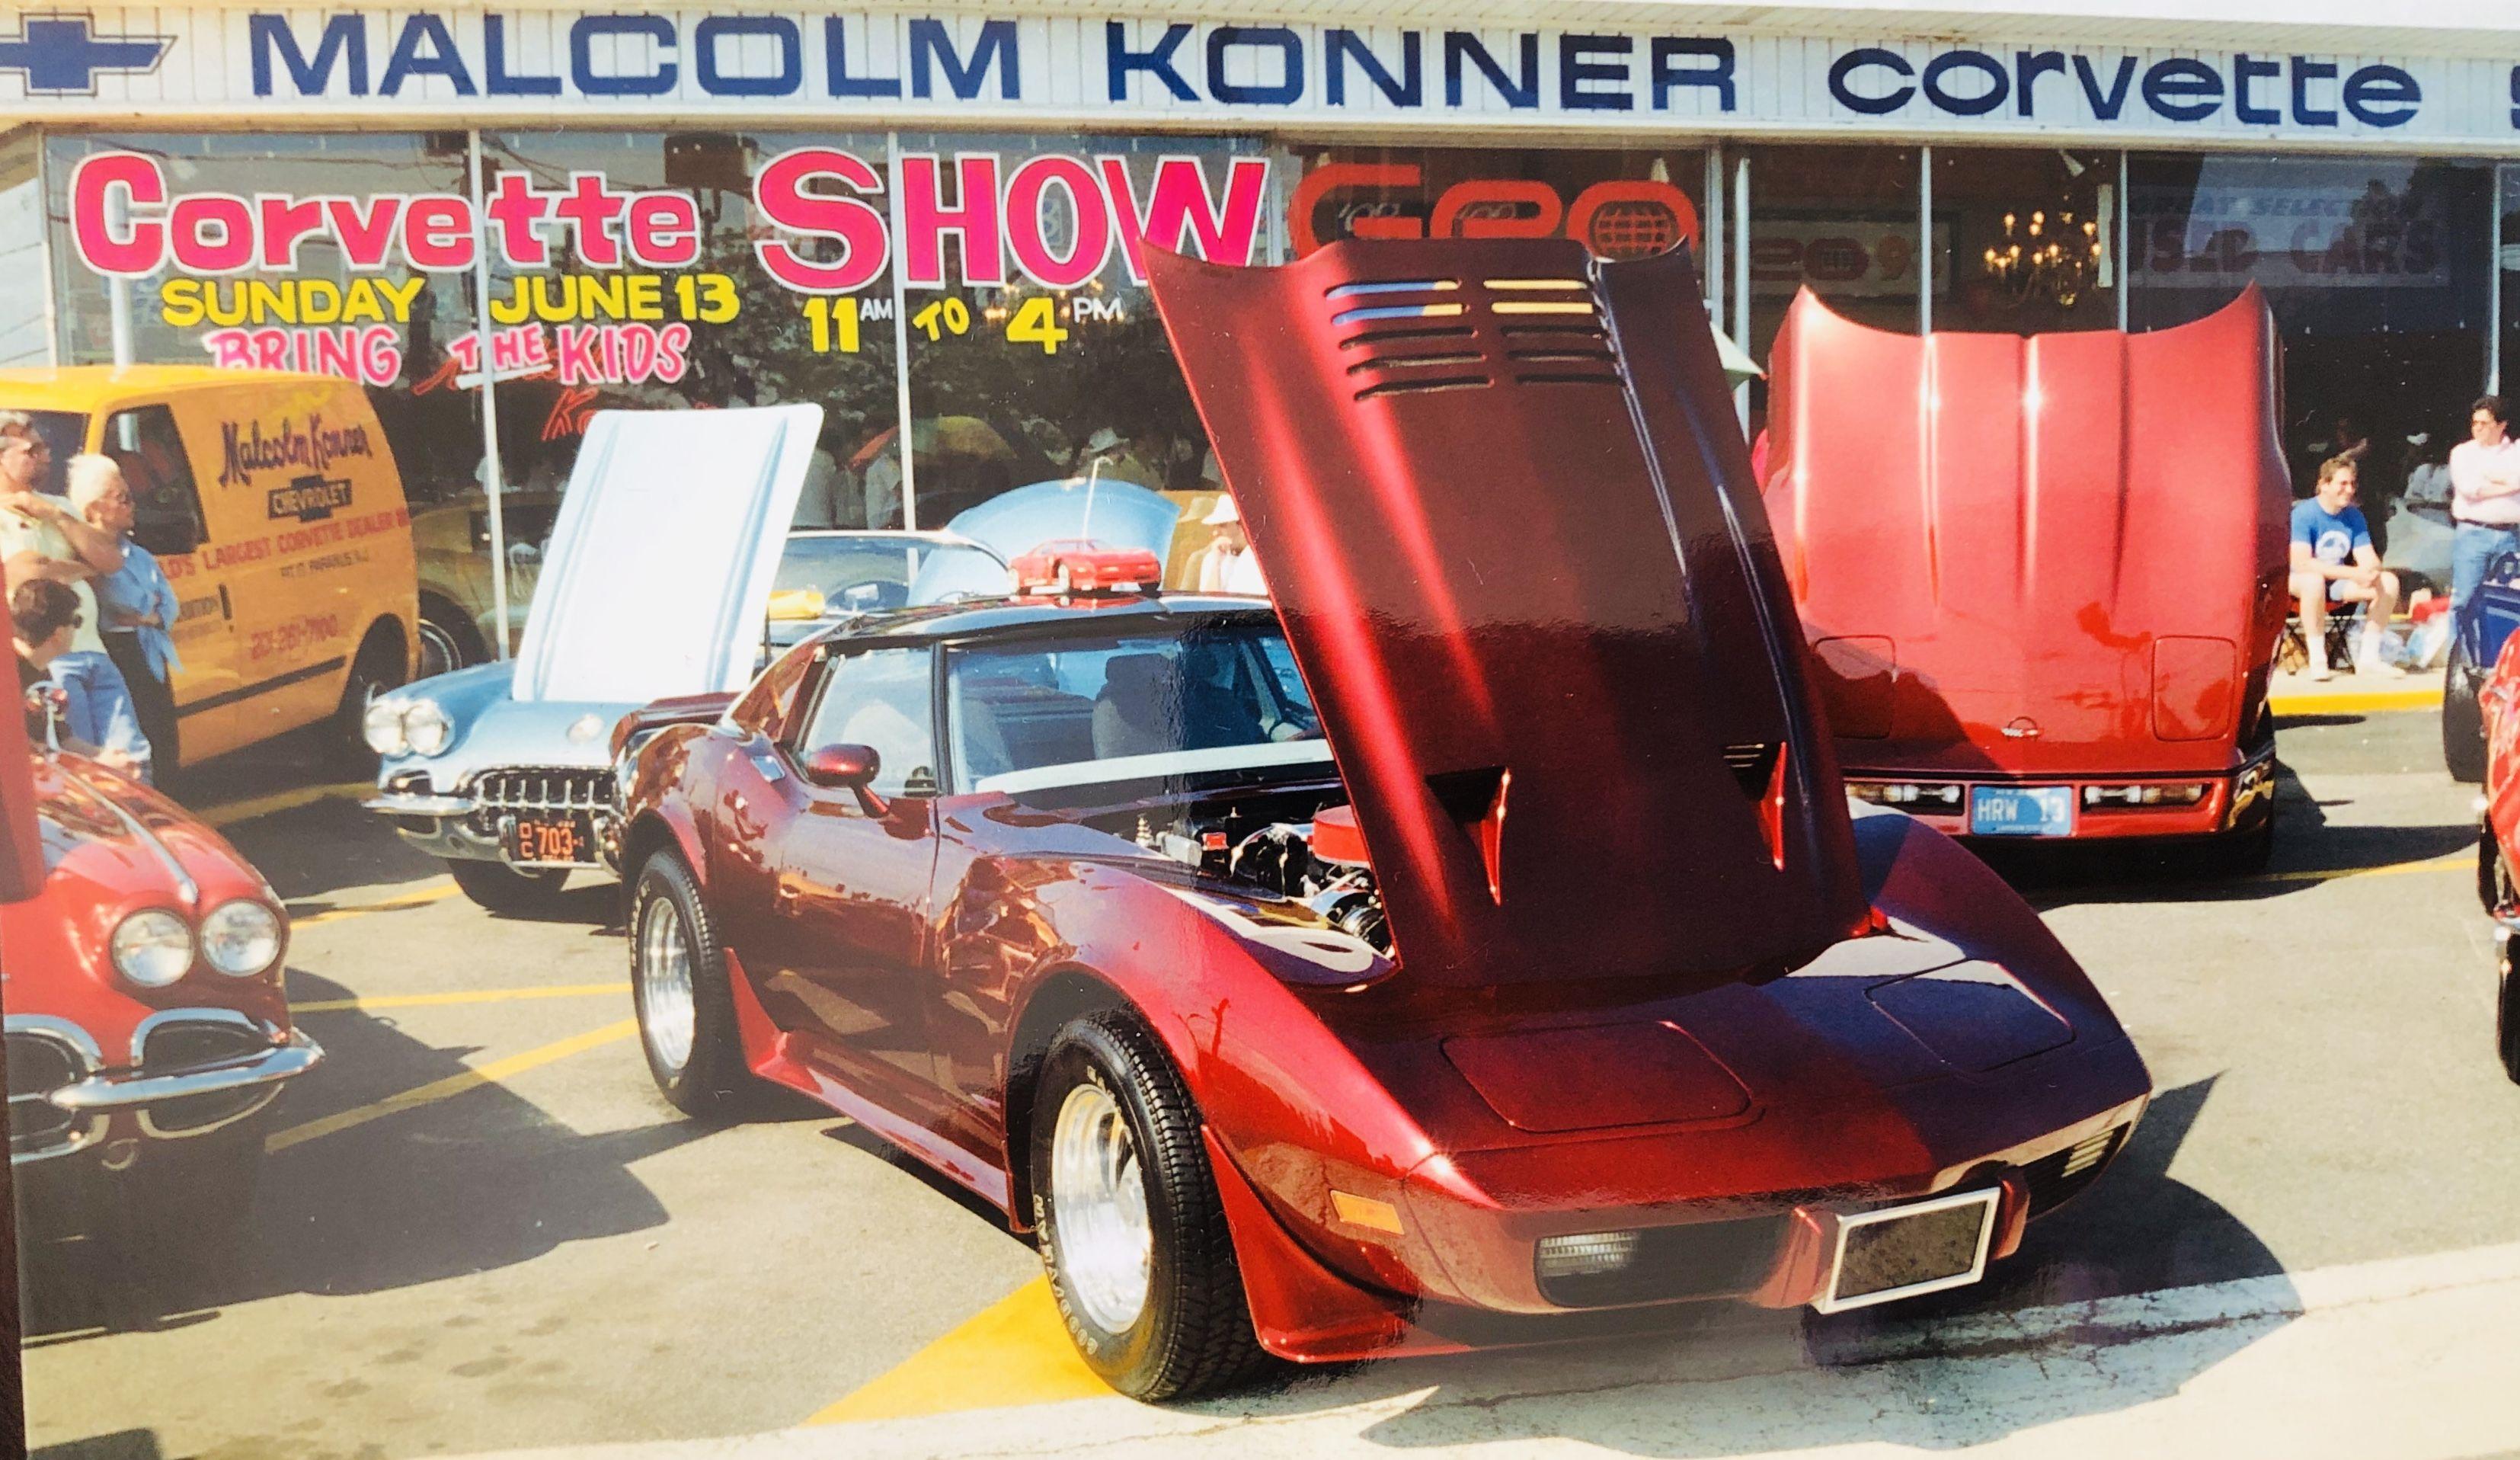 Malcolmkonner Corvetteshows Corvette In 2020 Corvette Chevrolet Corvette Chevrolet